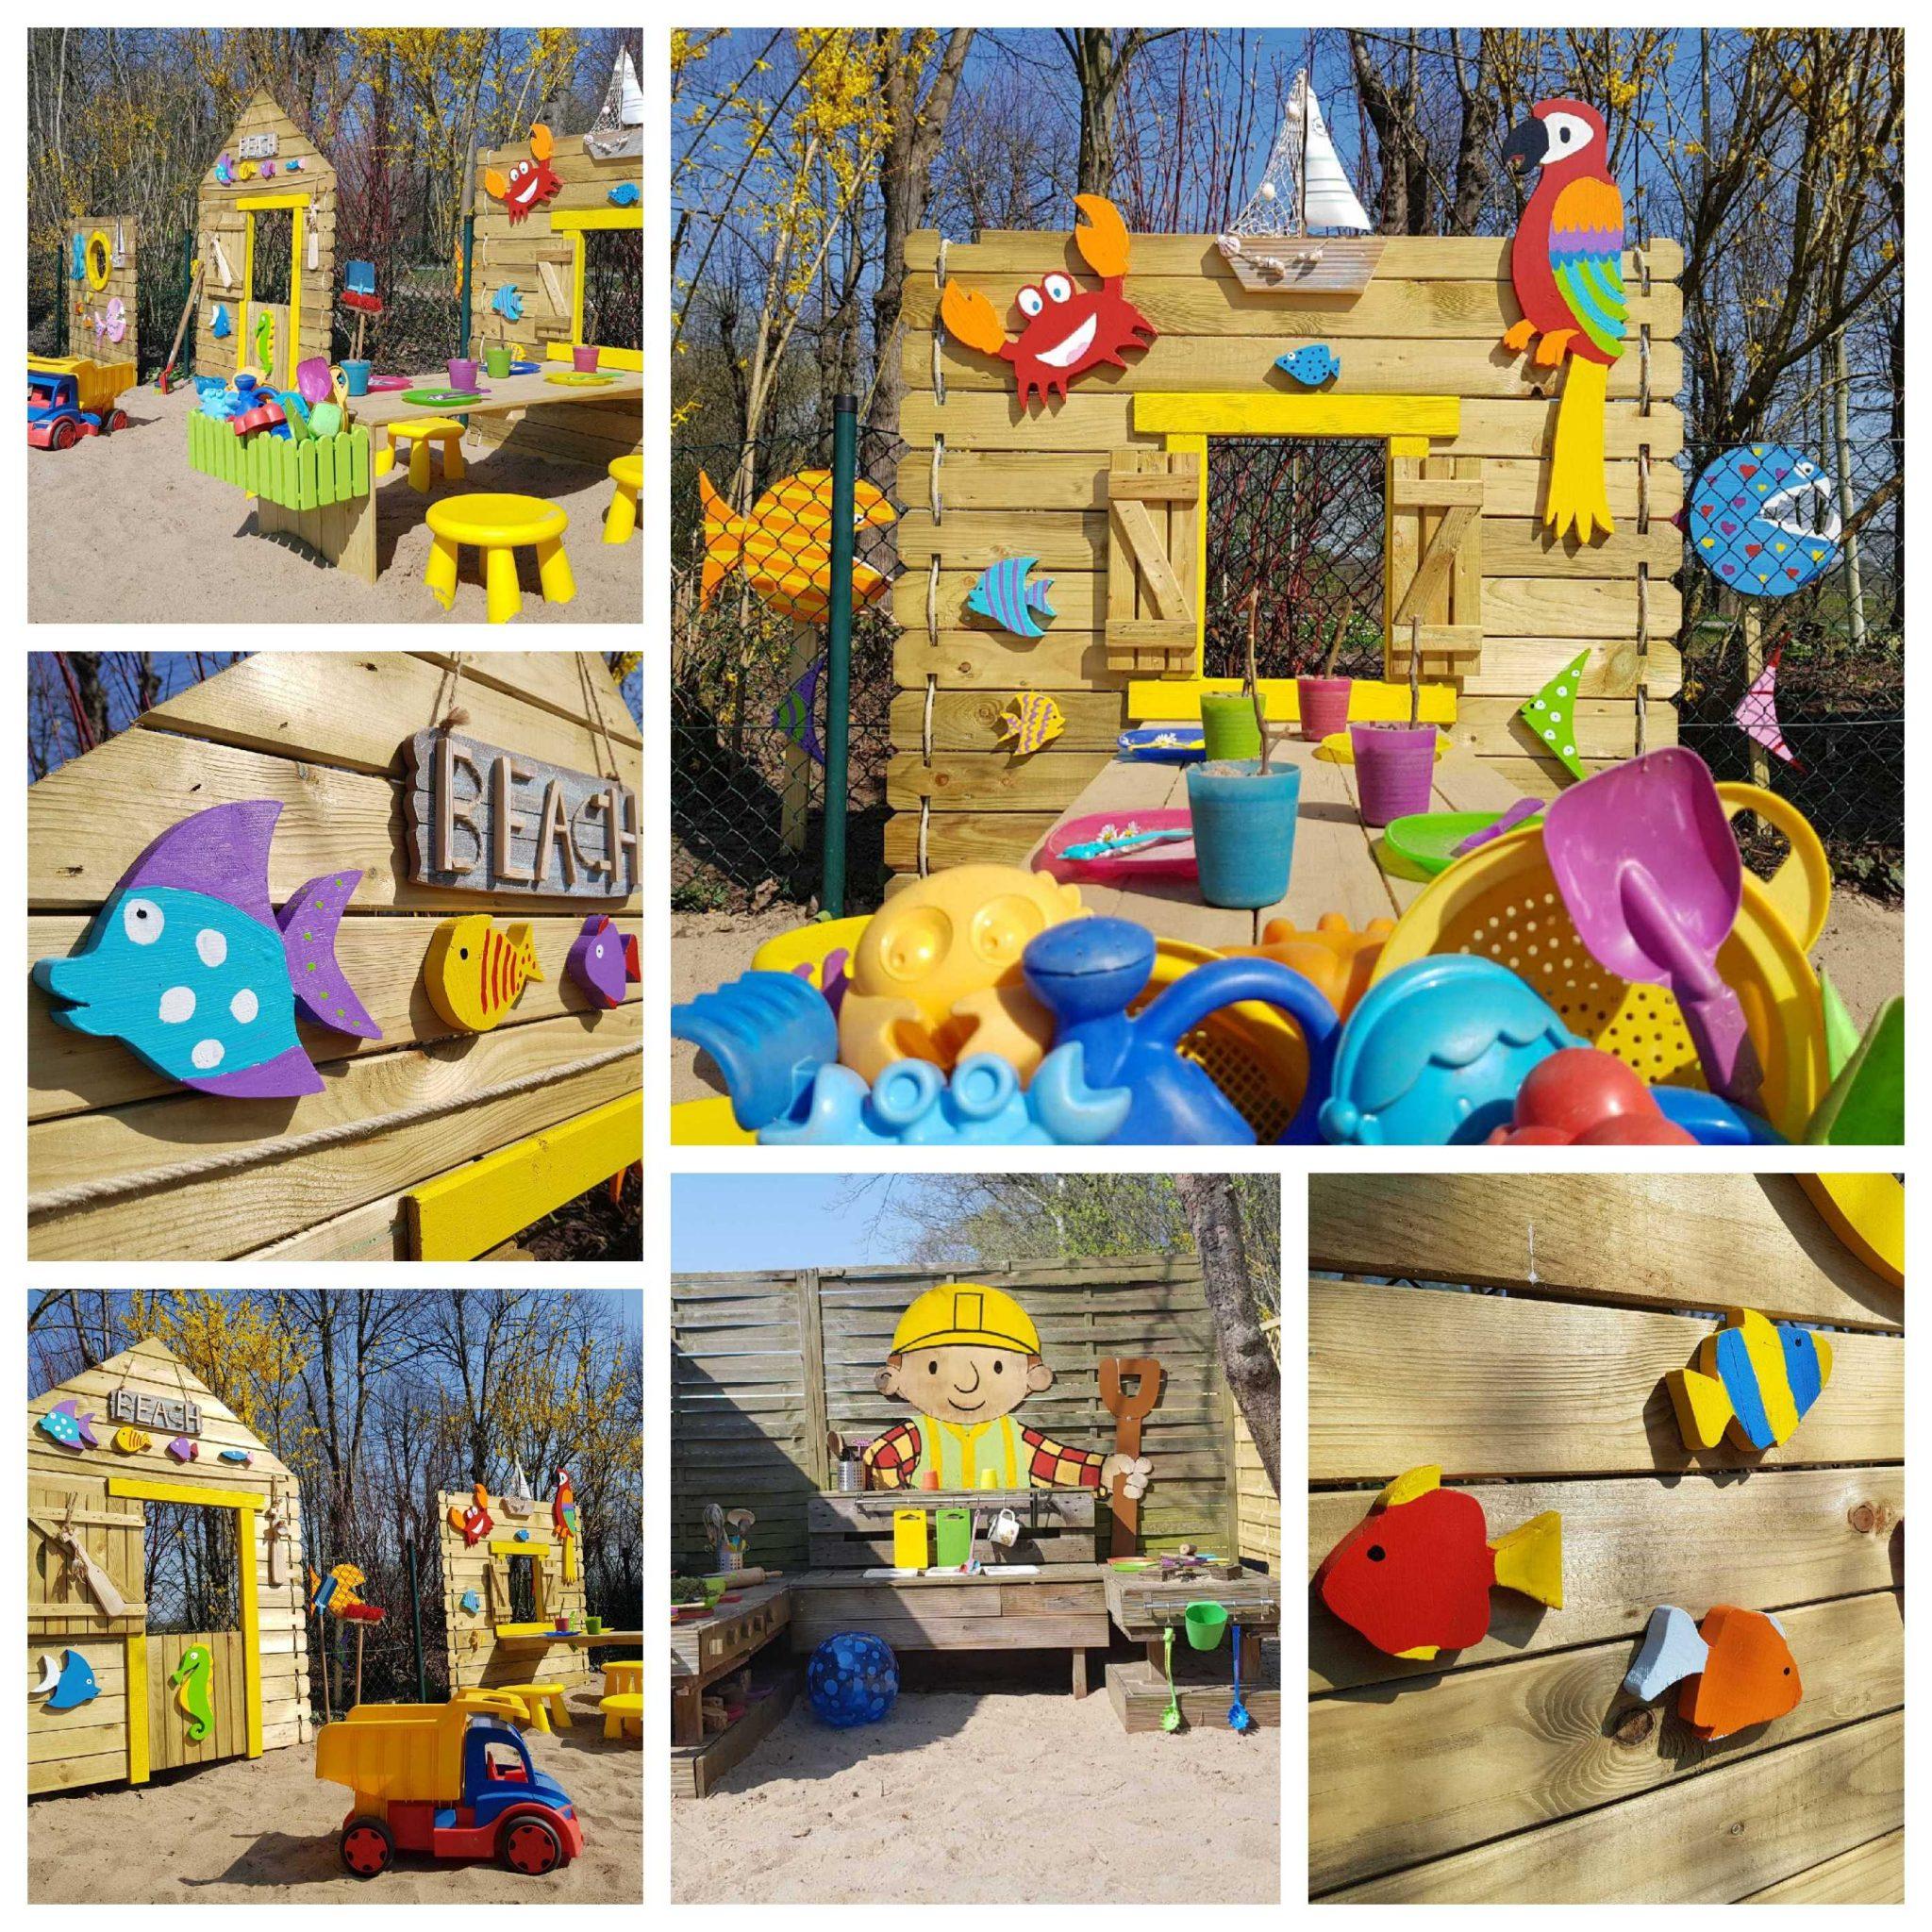 Kid Zone Erlebnisgarten mit Kinderbeachclub - Konzept